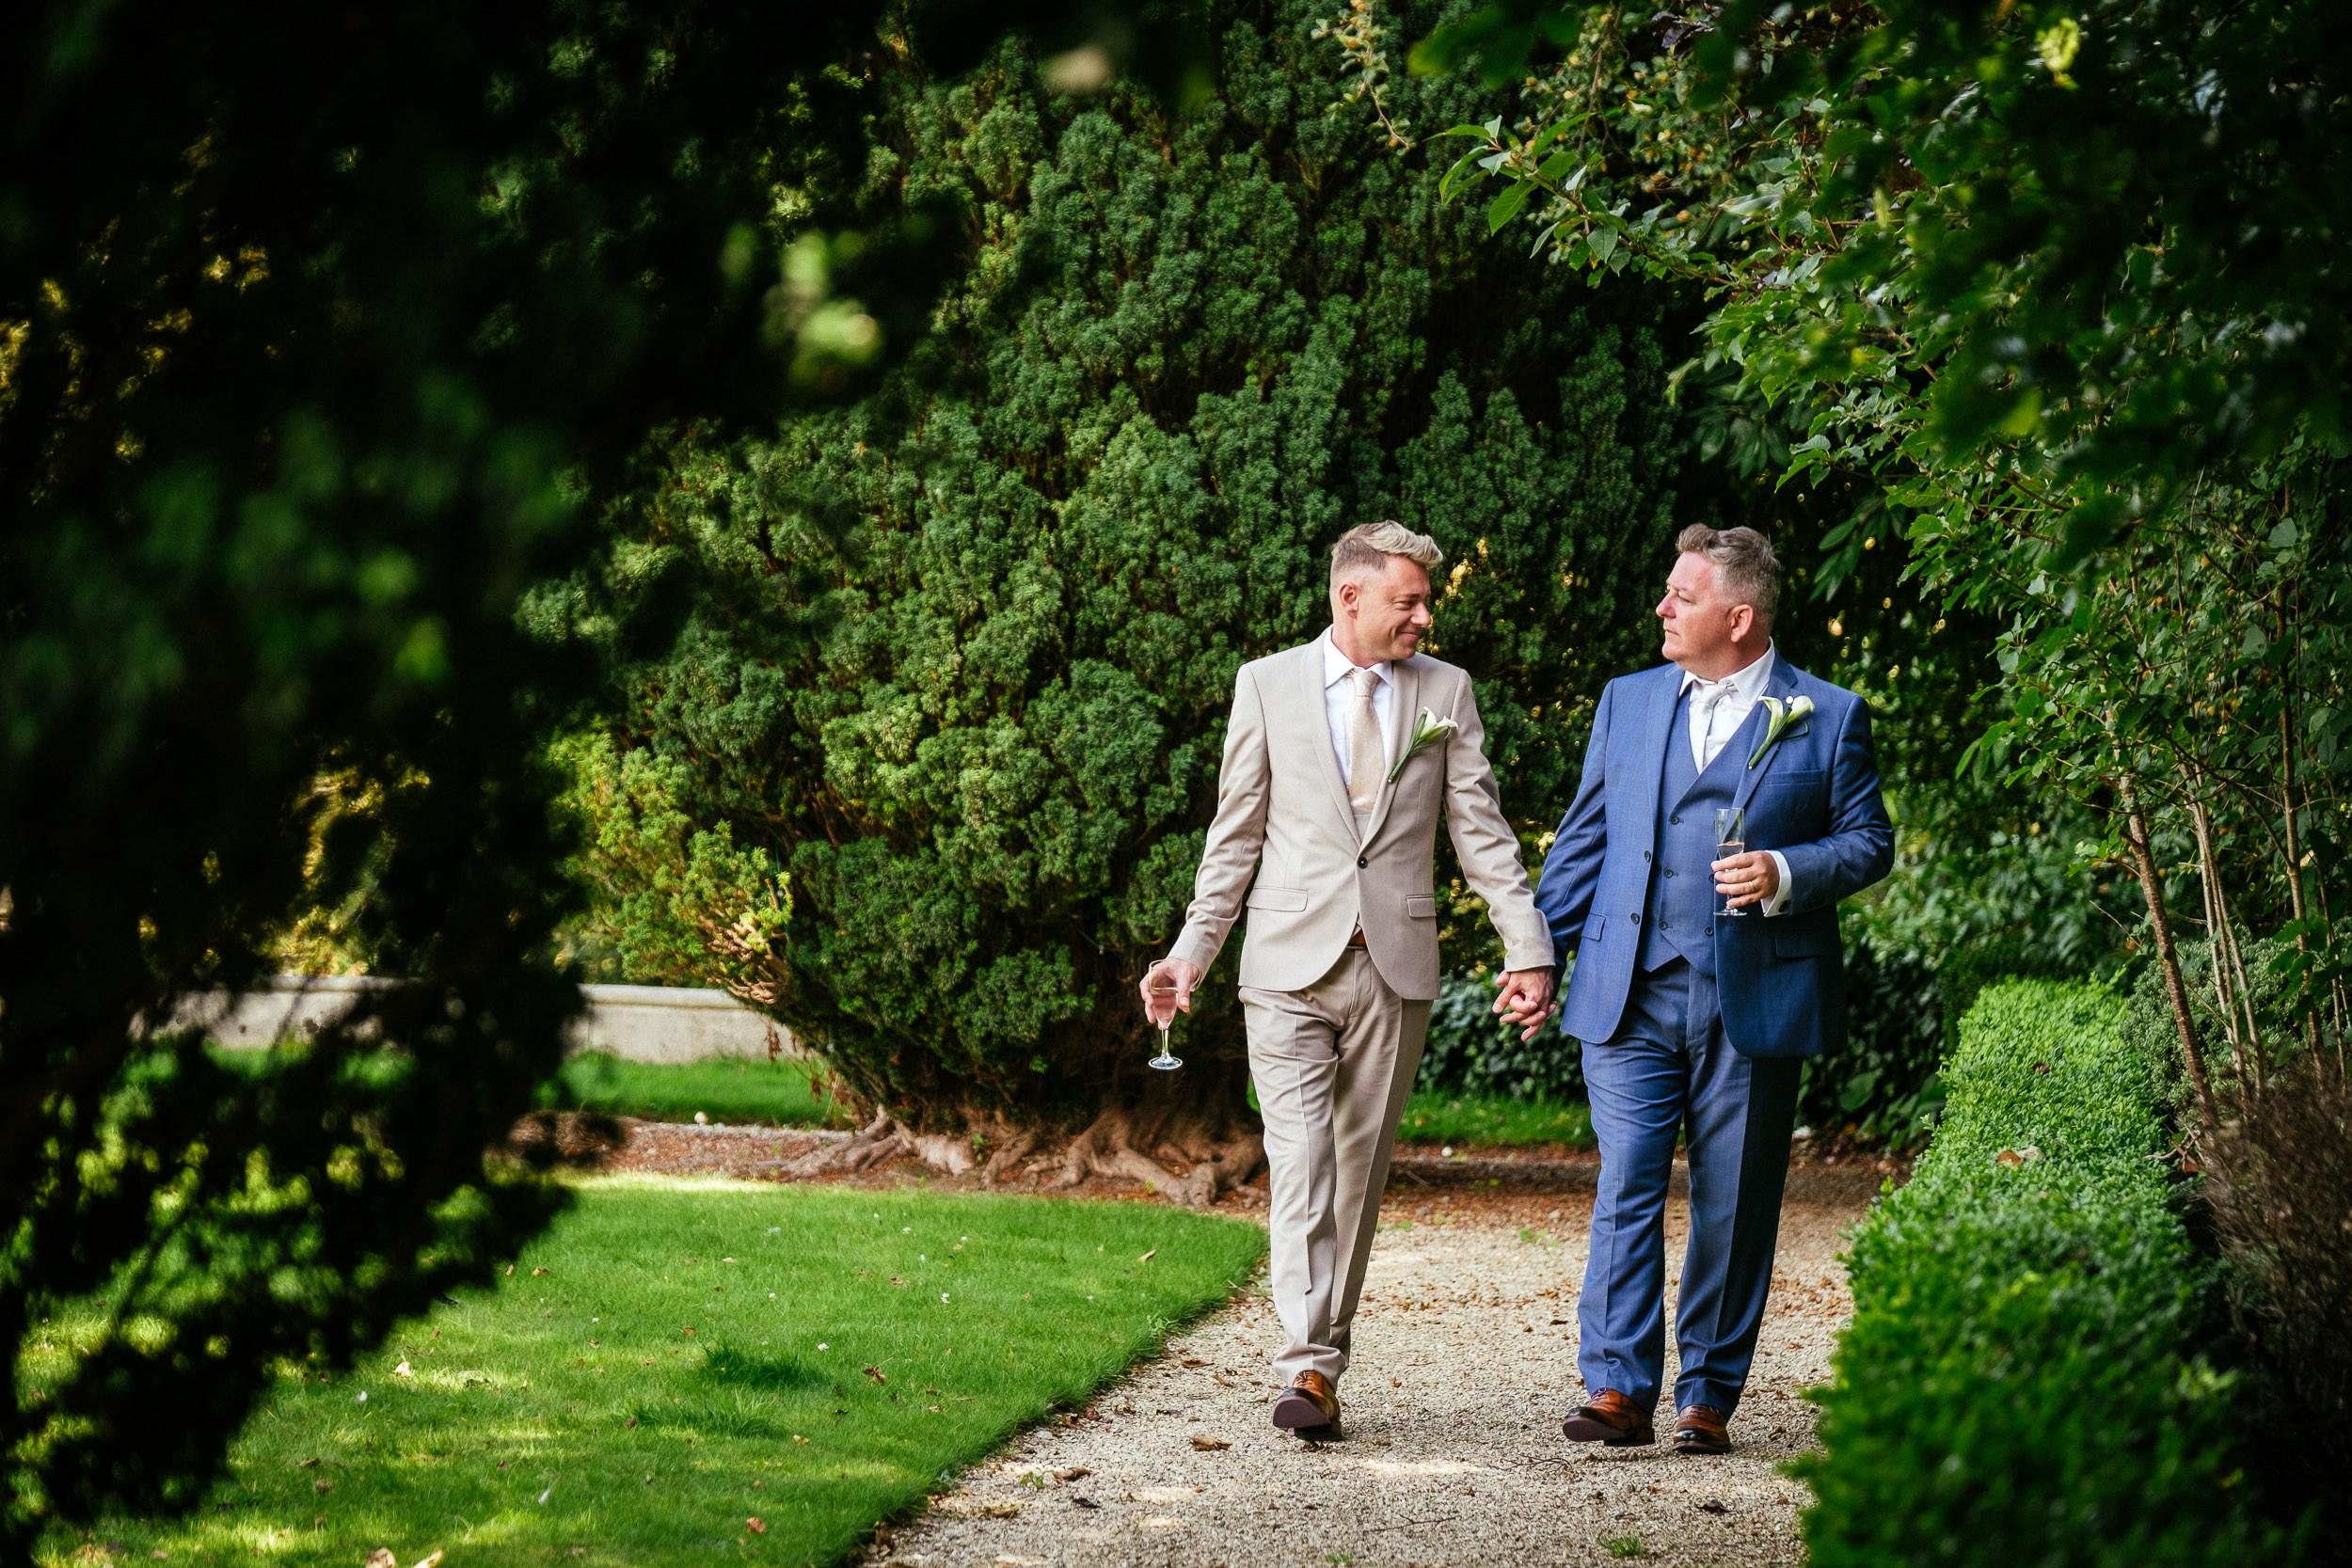 radisson blu stillorgan dublin Wedding Photographer 41